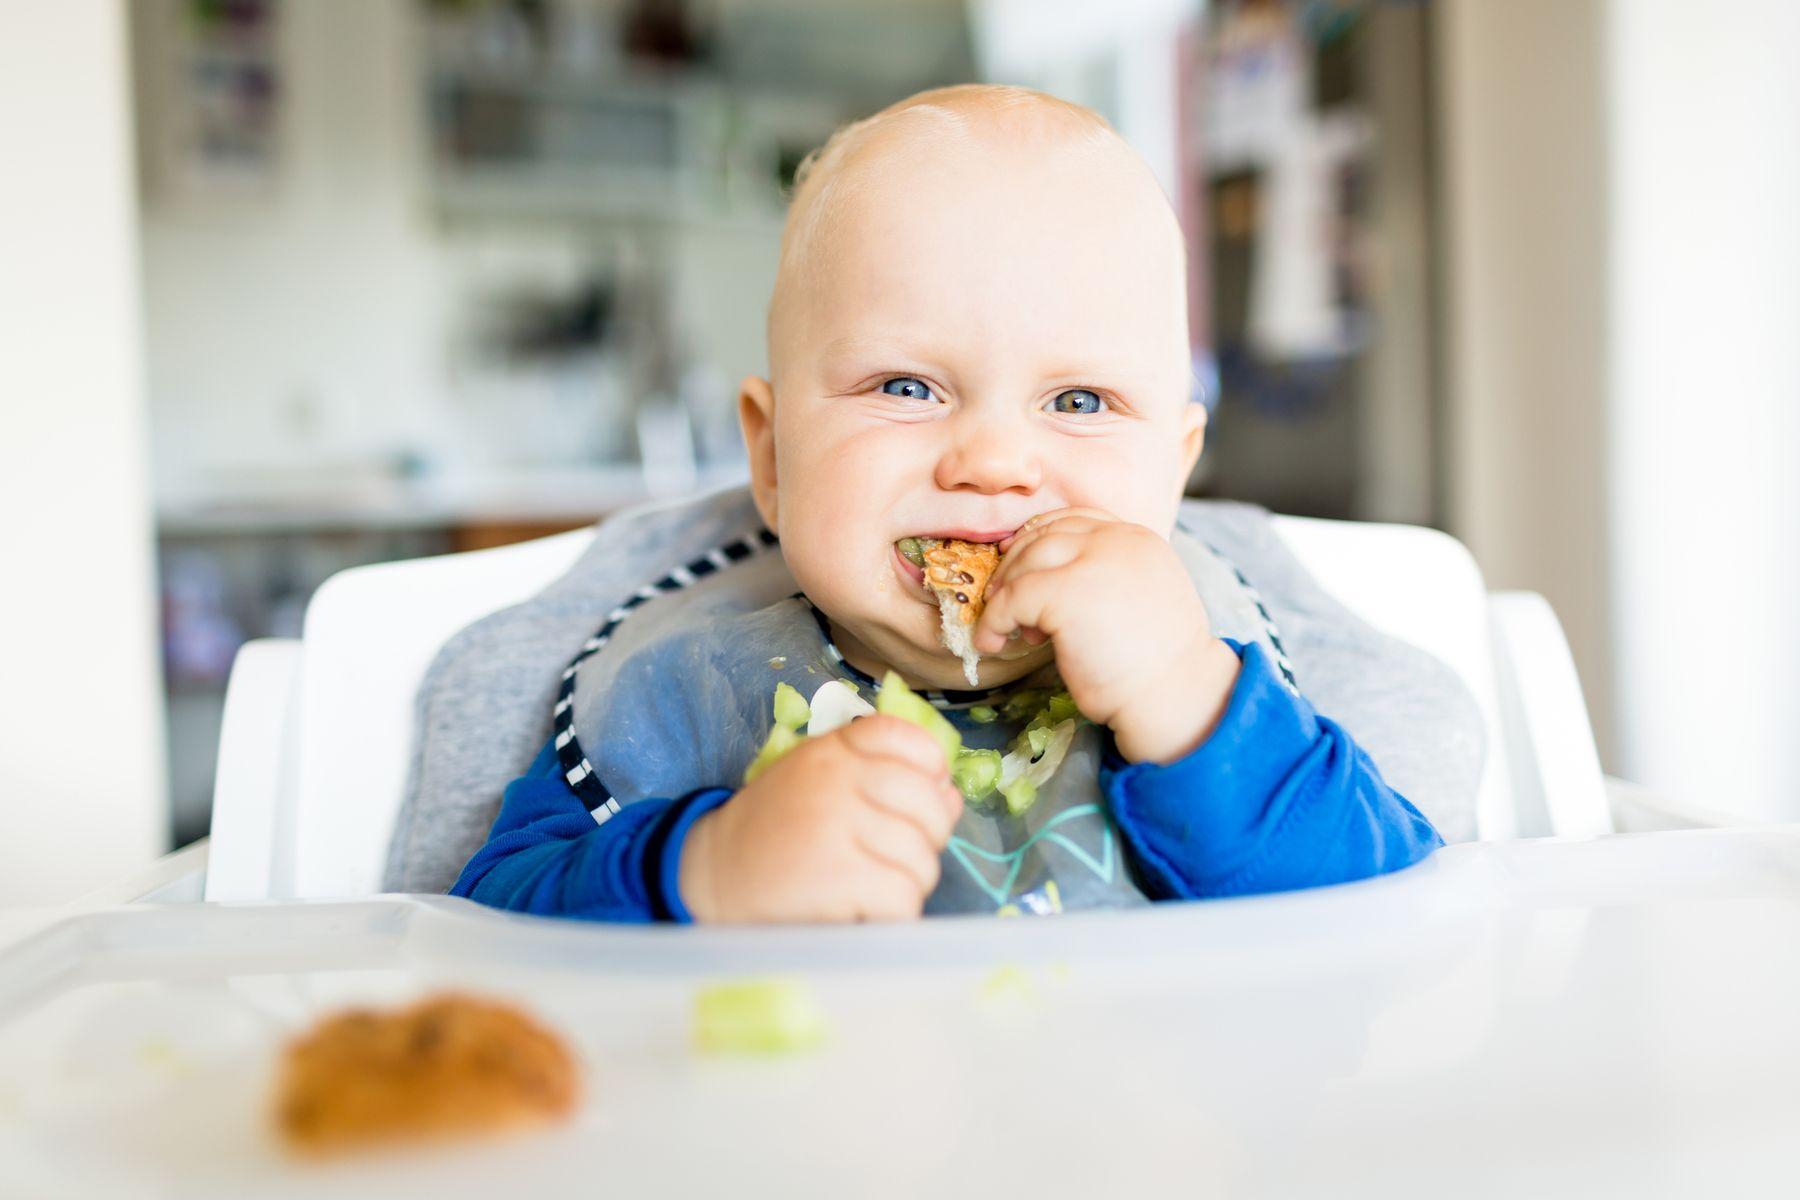 Yếm nilon cho bé ăn dặm